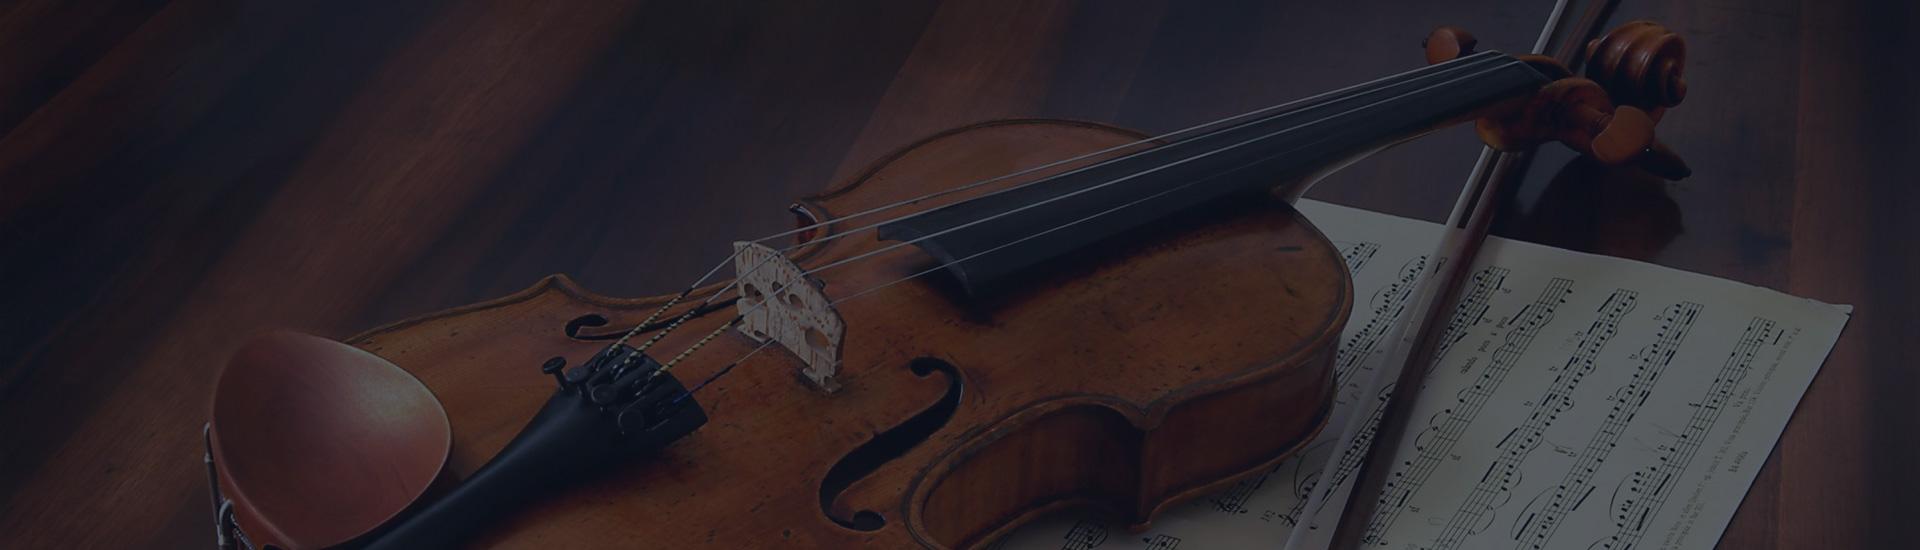 cssom cremona violins